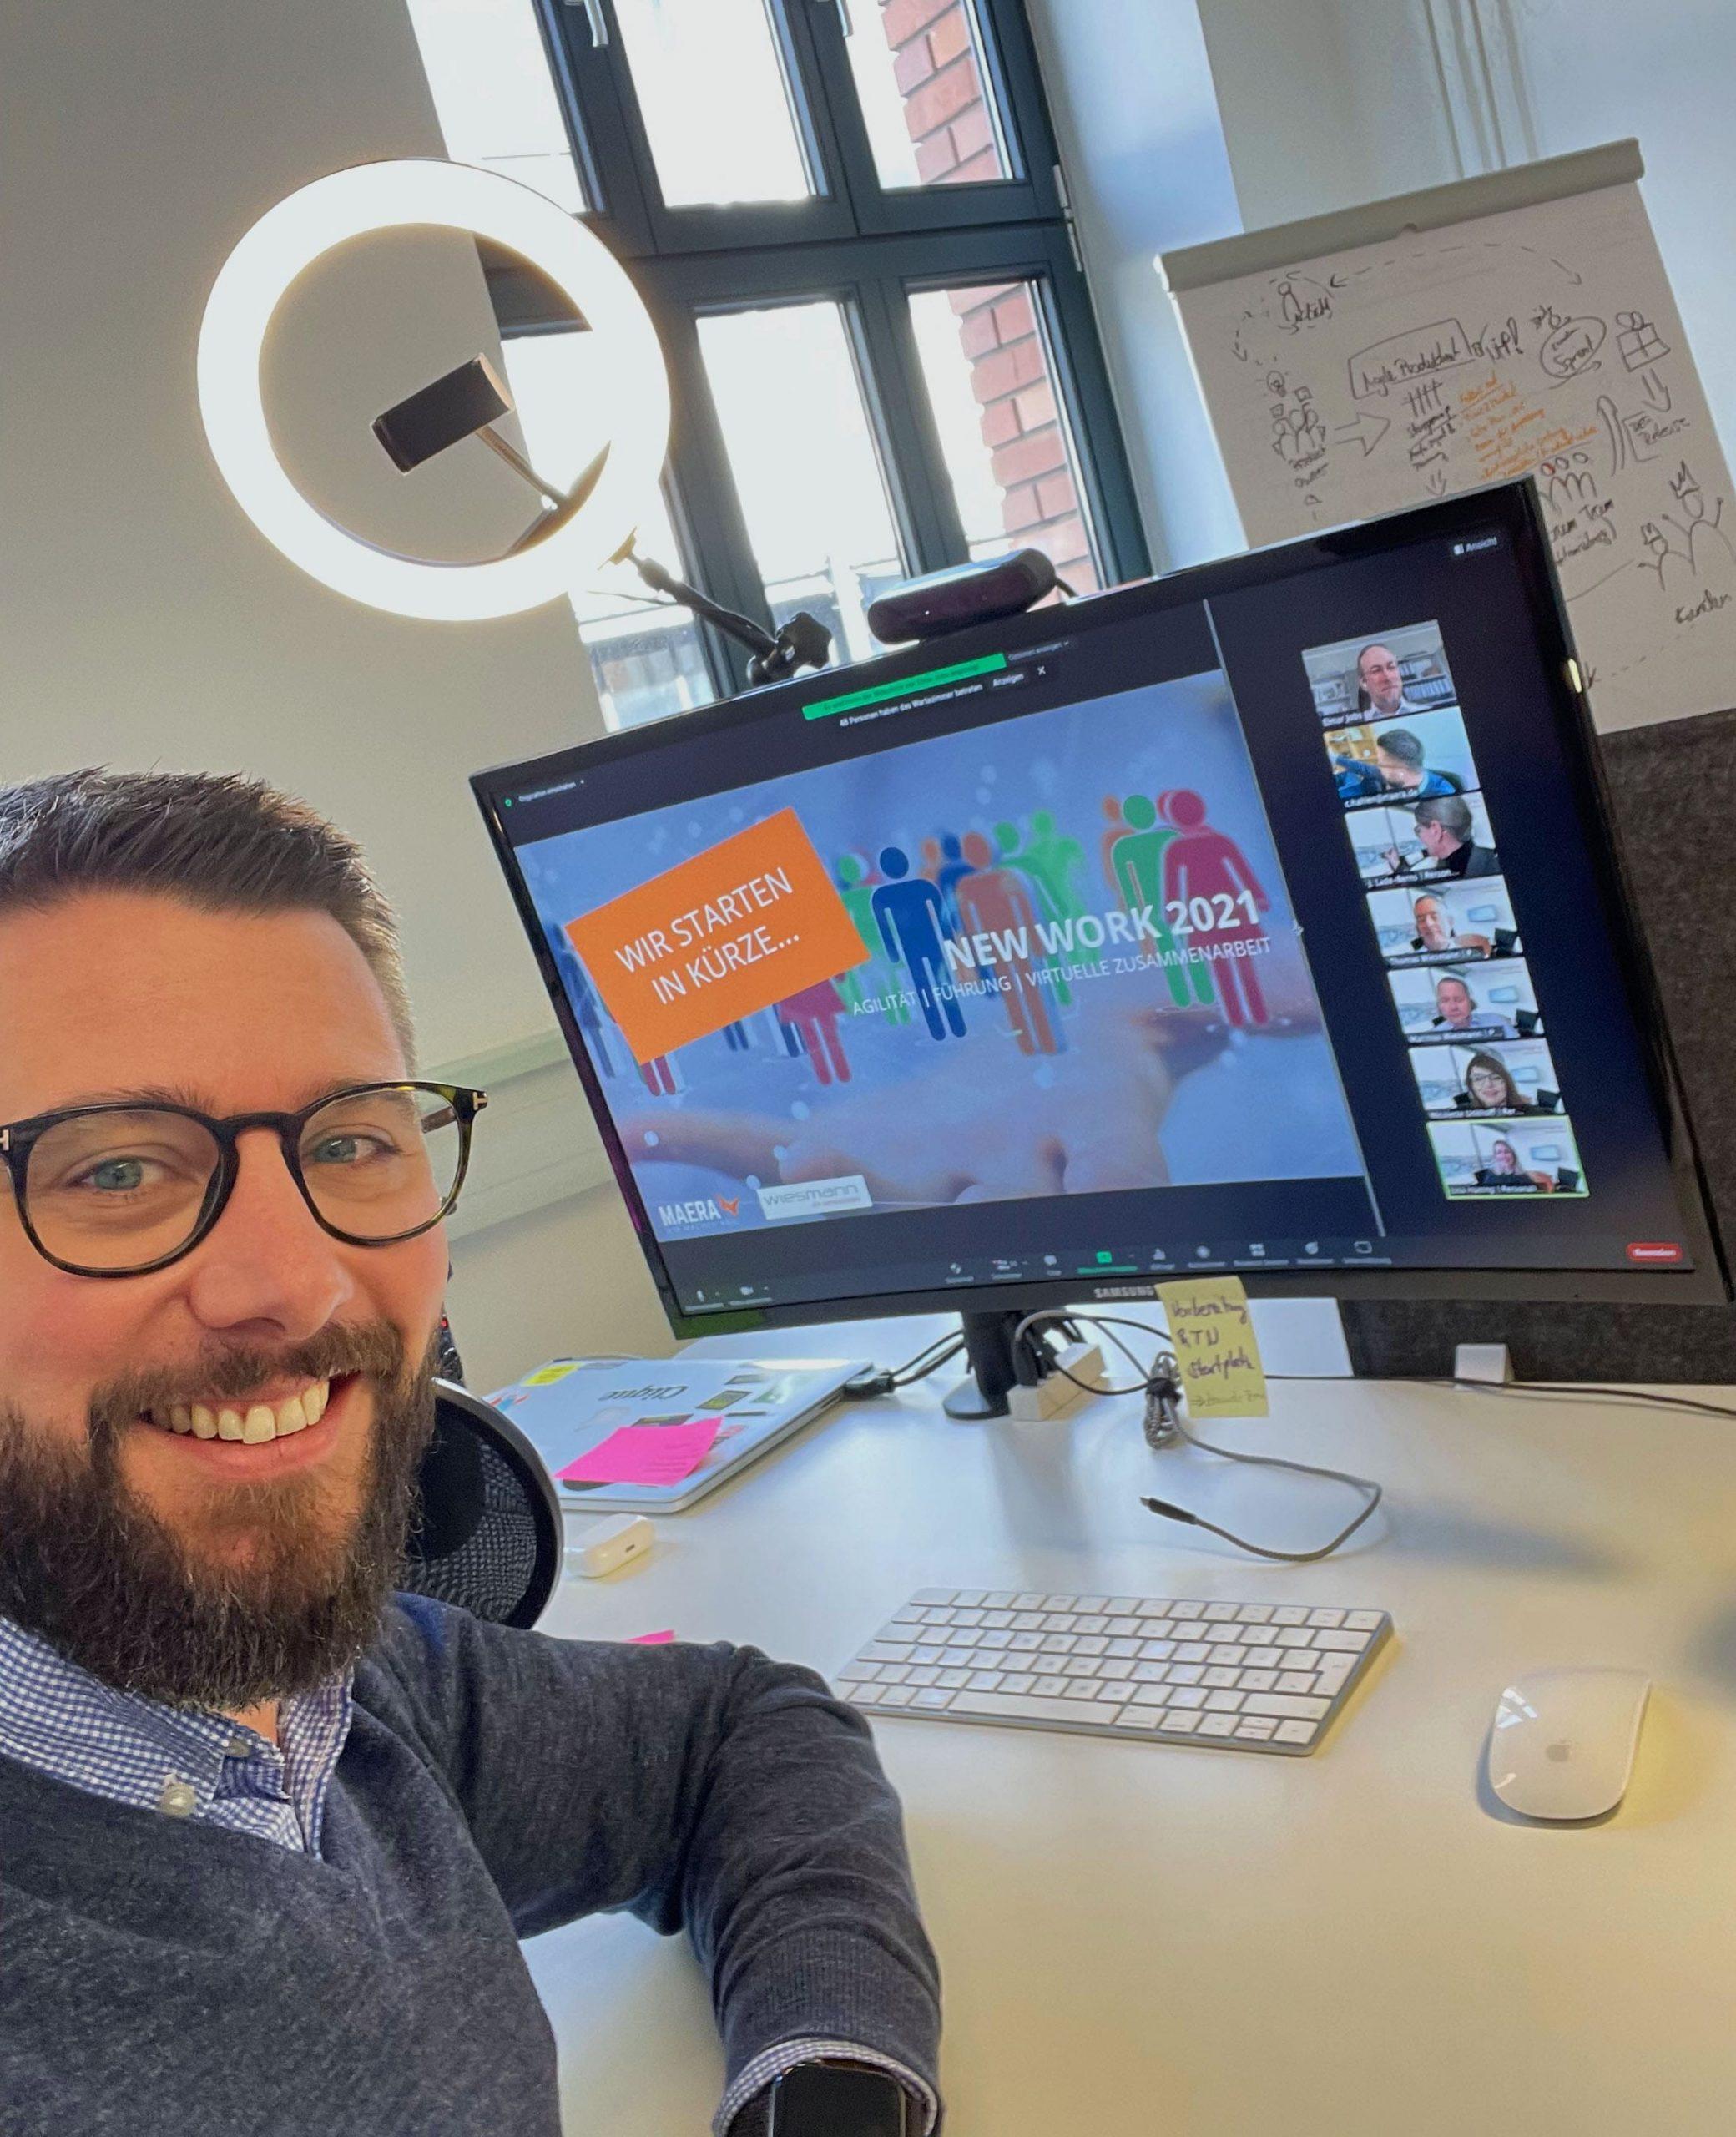 Geschäftsführer Christian hält einen Wprkshop